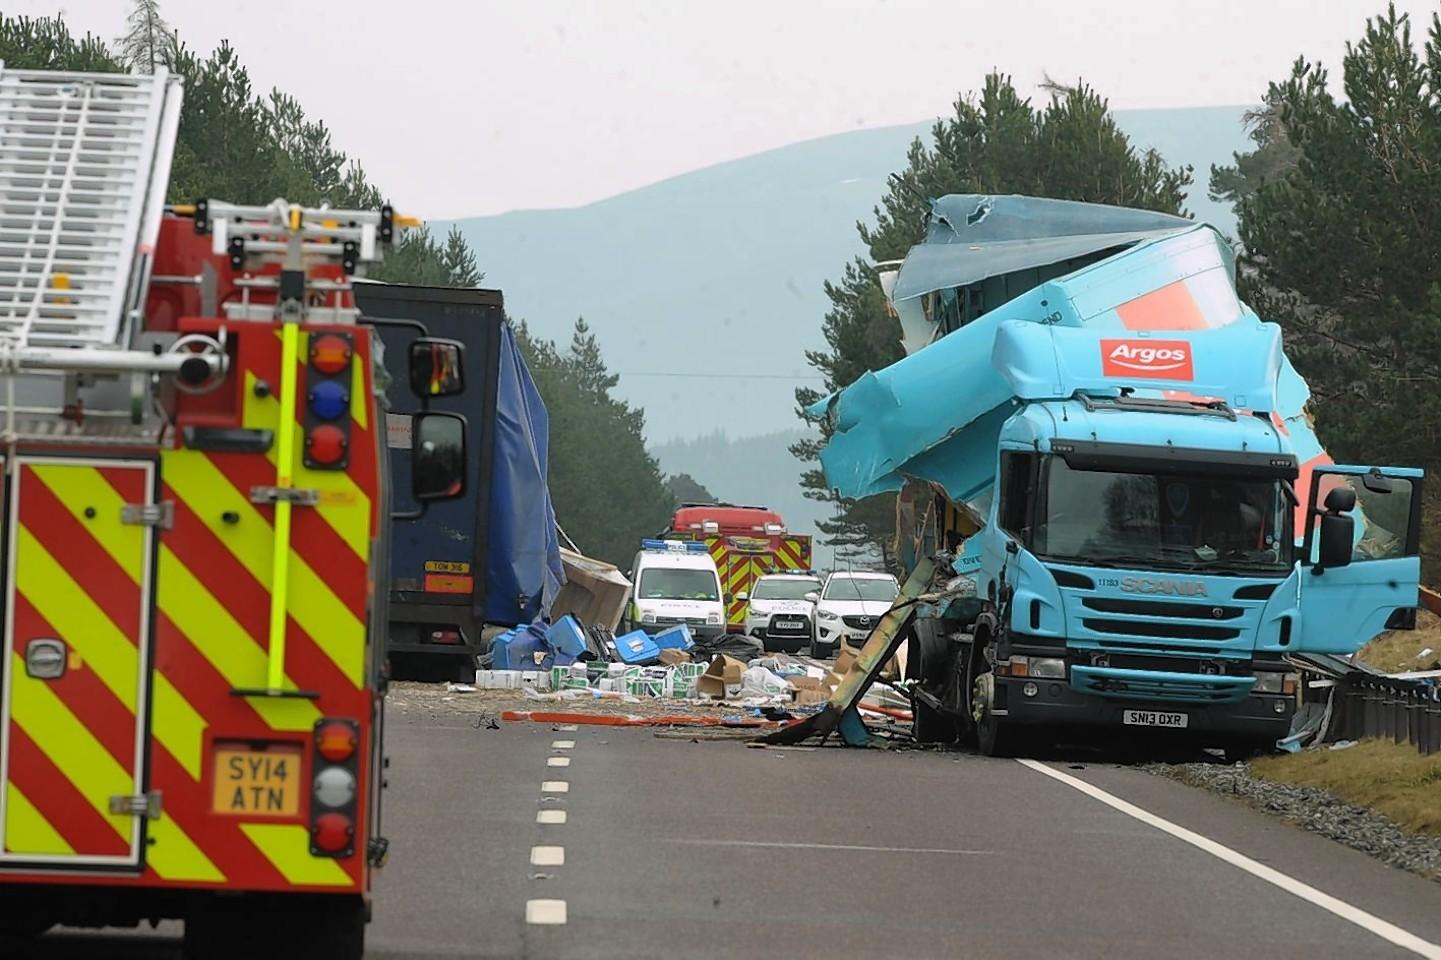 The crash scene on the A9 near Kingussie